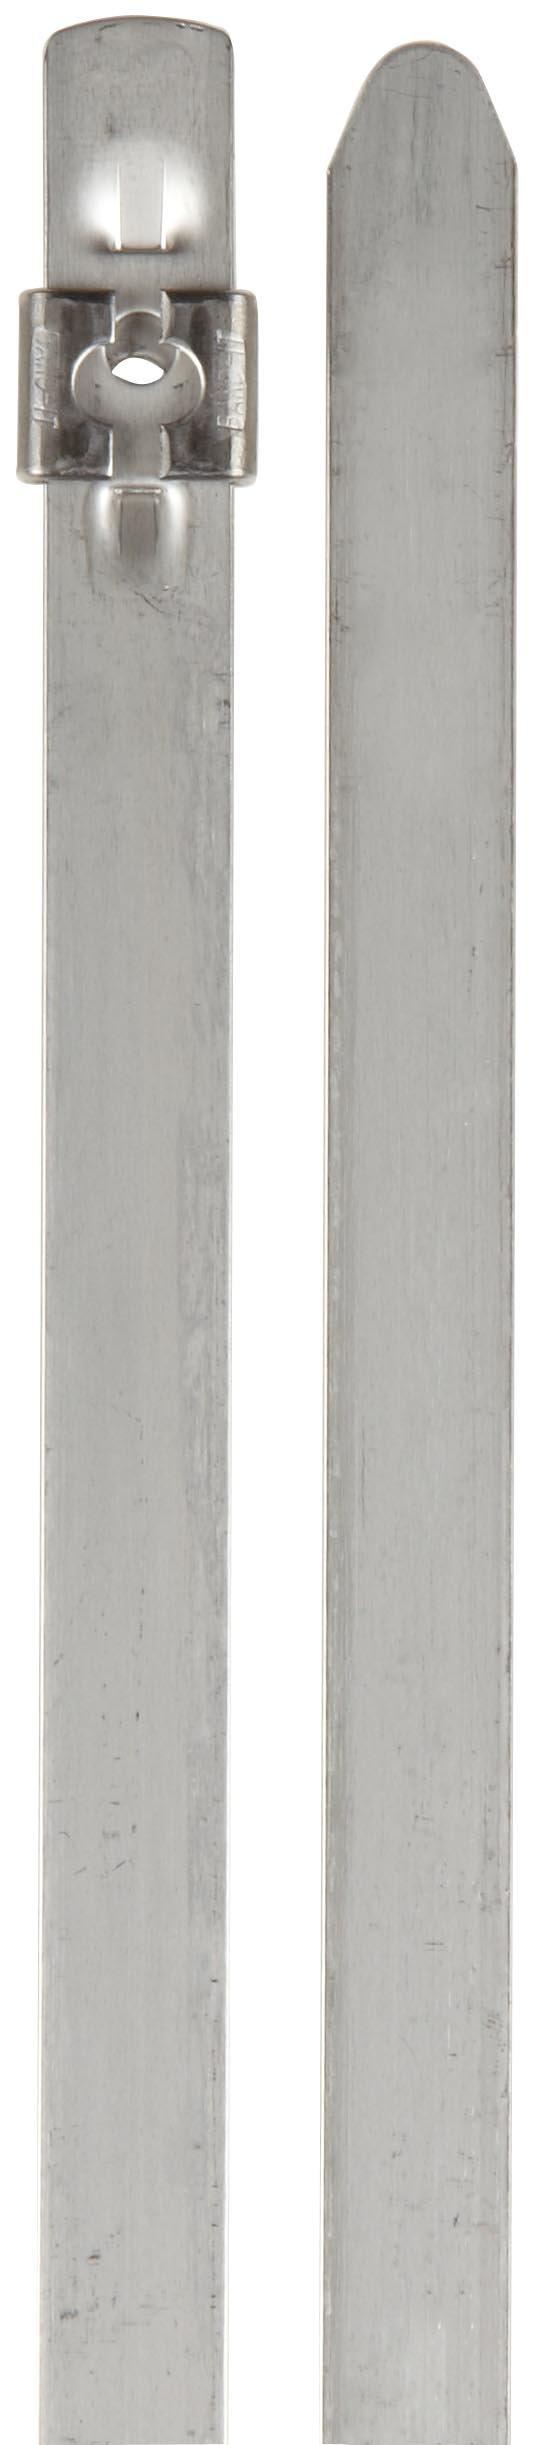 BAND-IT AS6229 Tie-Lok 304 Stainless Steel Cable Tie, 3/8'' Width, 11.5'' Length, 2'' Maximum Diameter, 100 per Bag